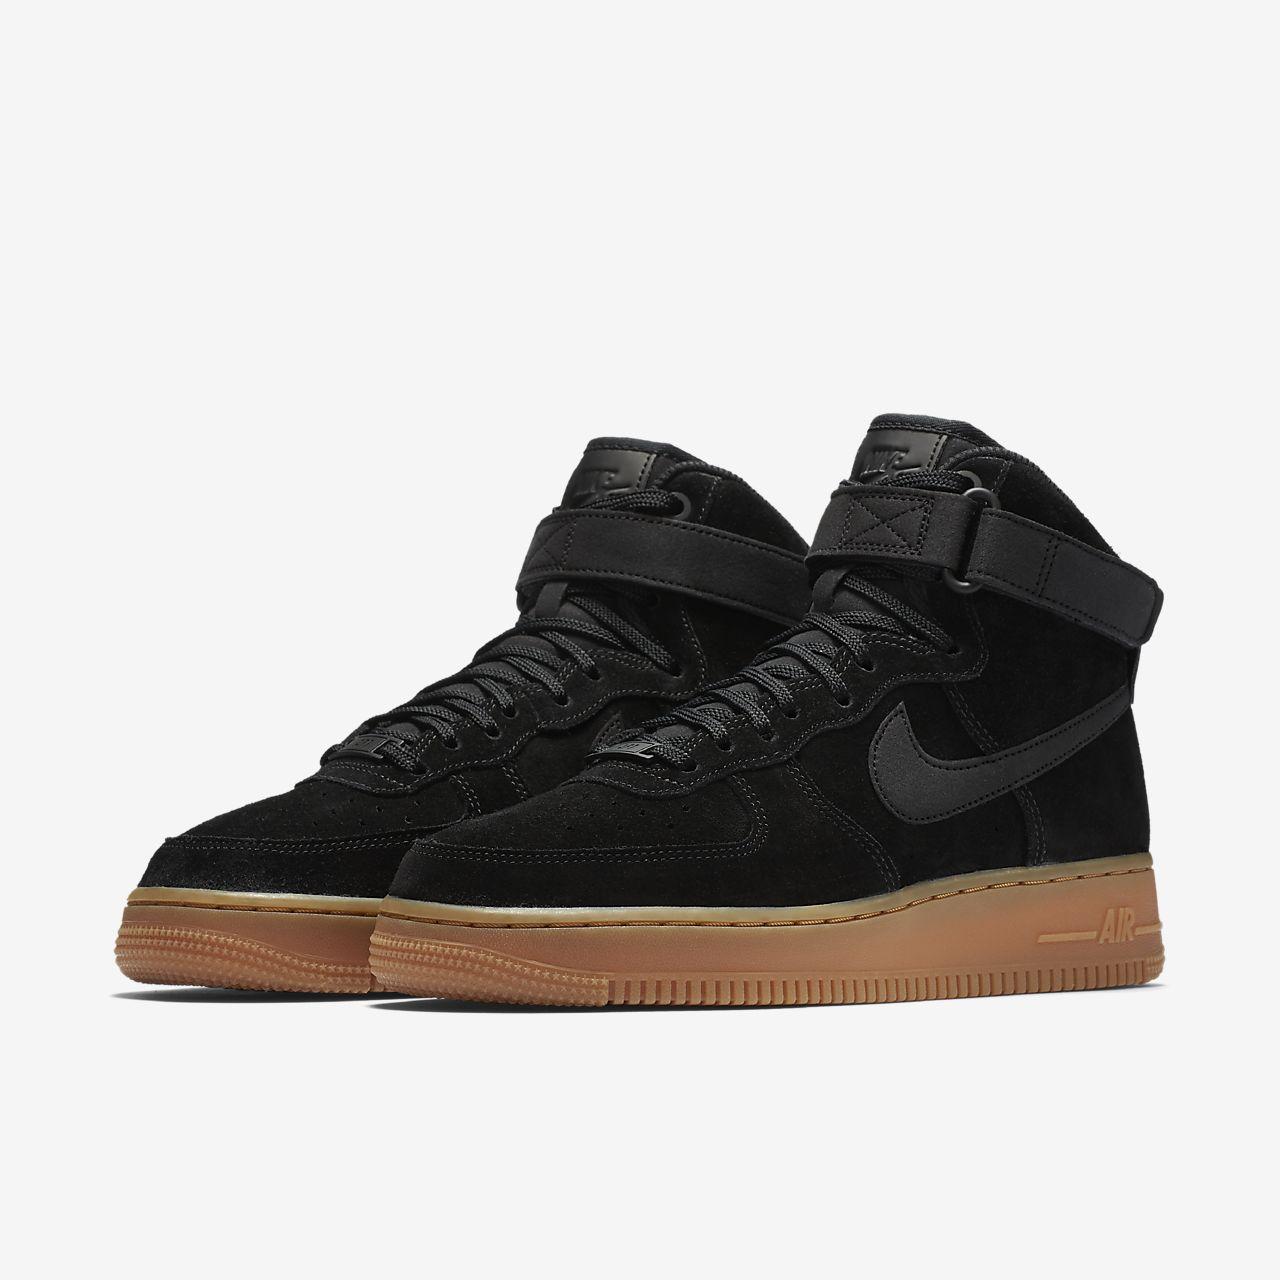 ... Chaussure Nike Air Force 1 High SE pour Femme